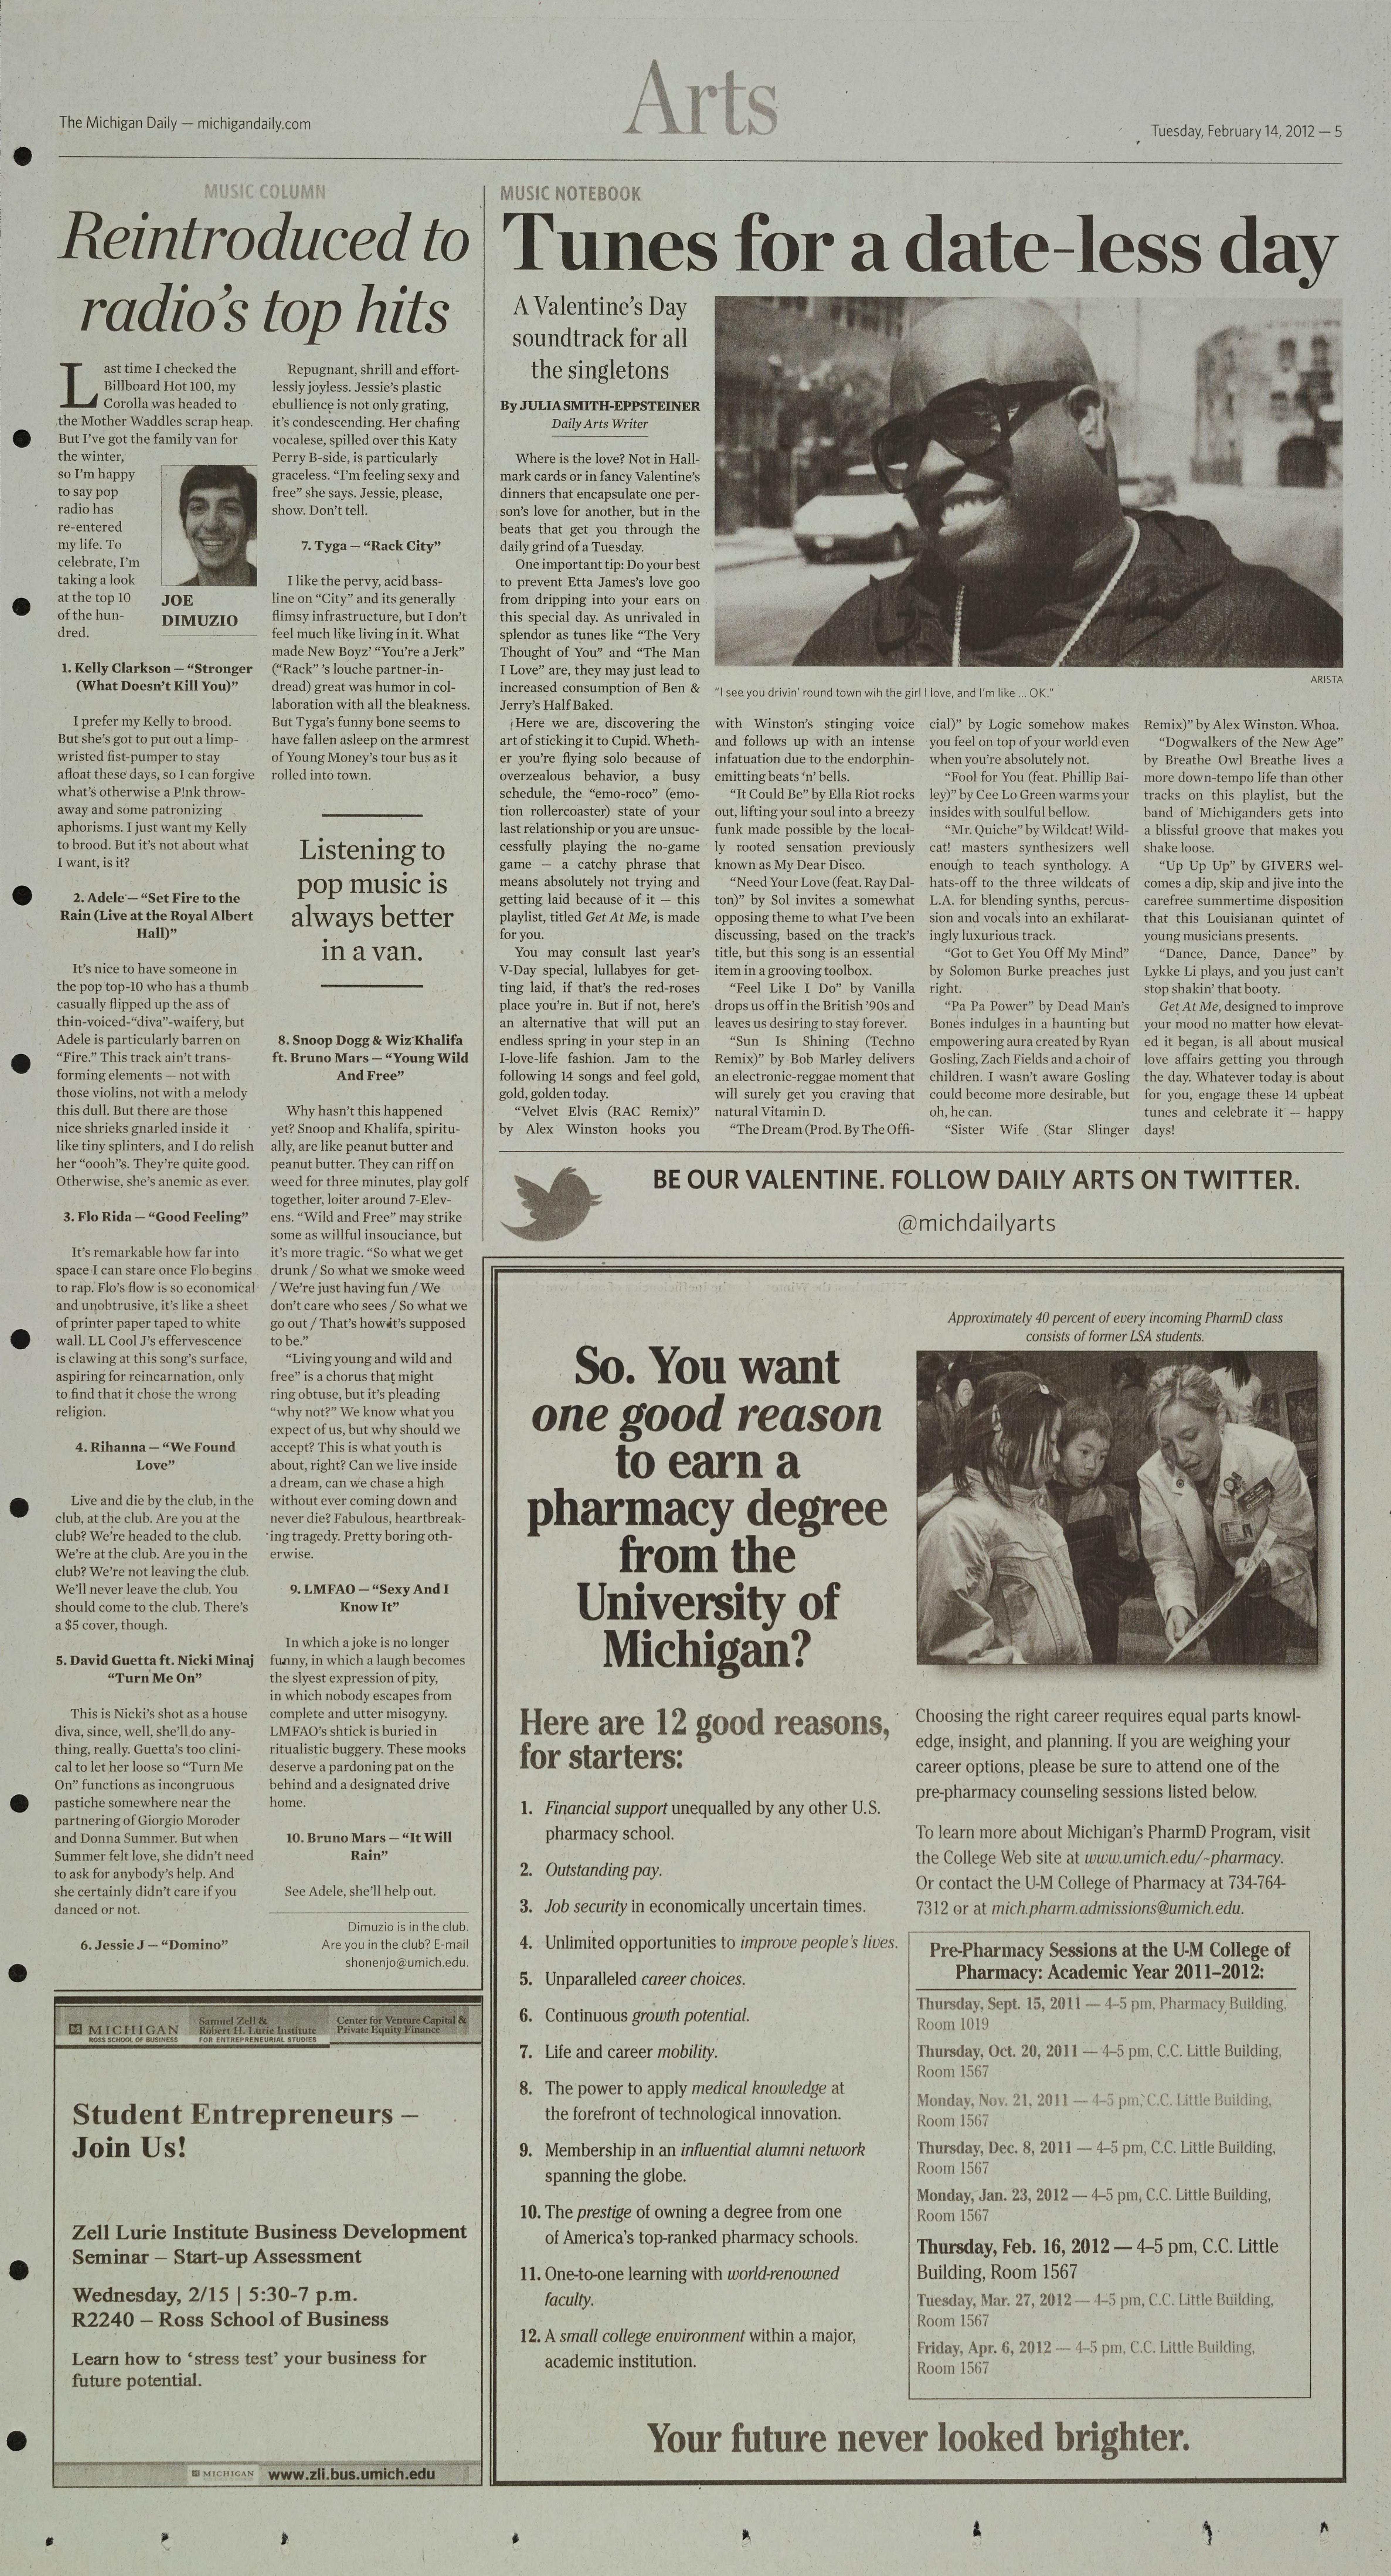 Michigan Daily Digital Archives - February 14, 2012 (vol